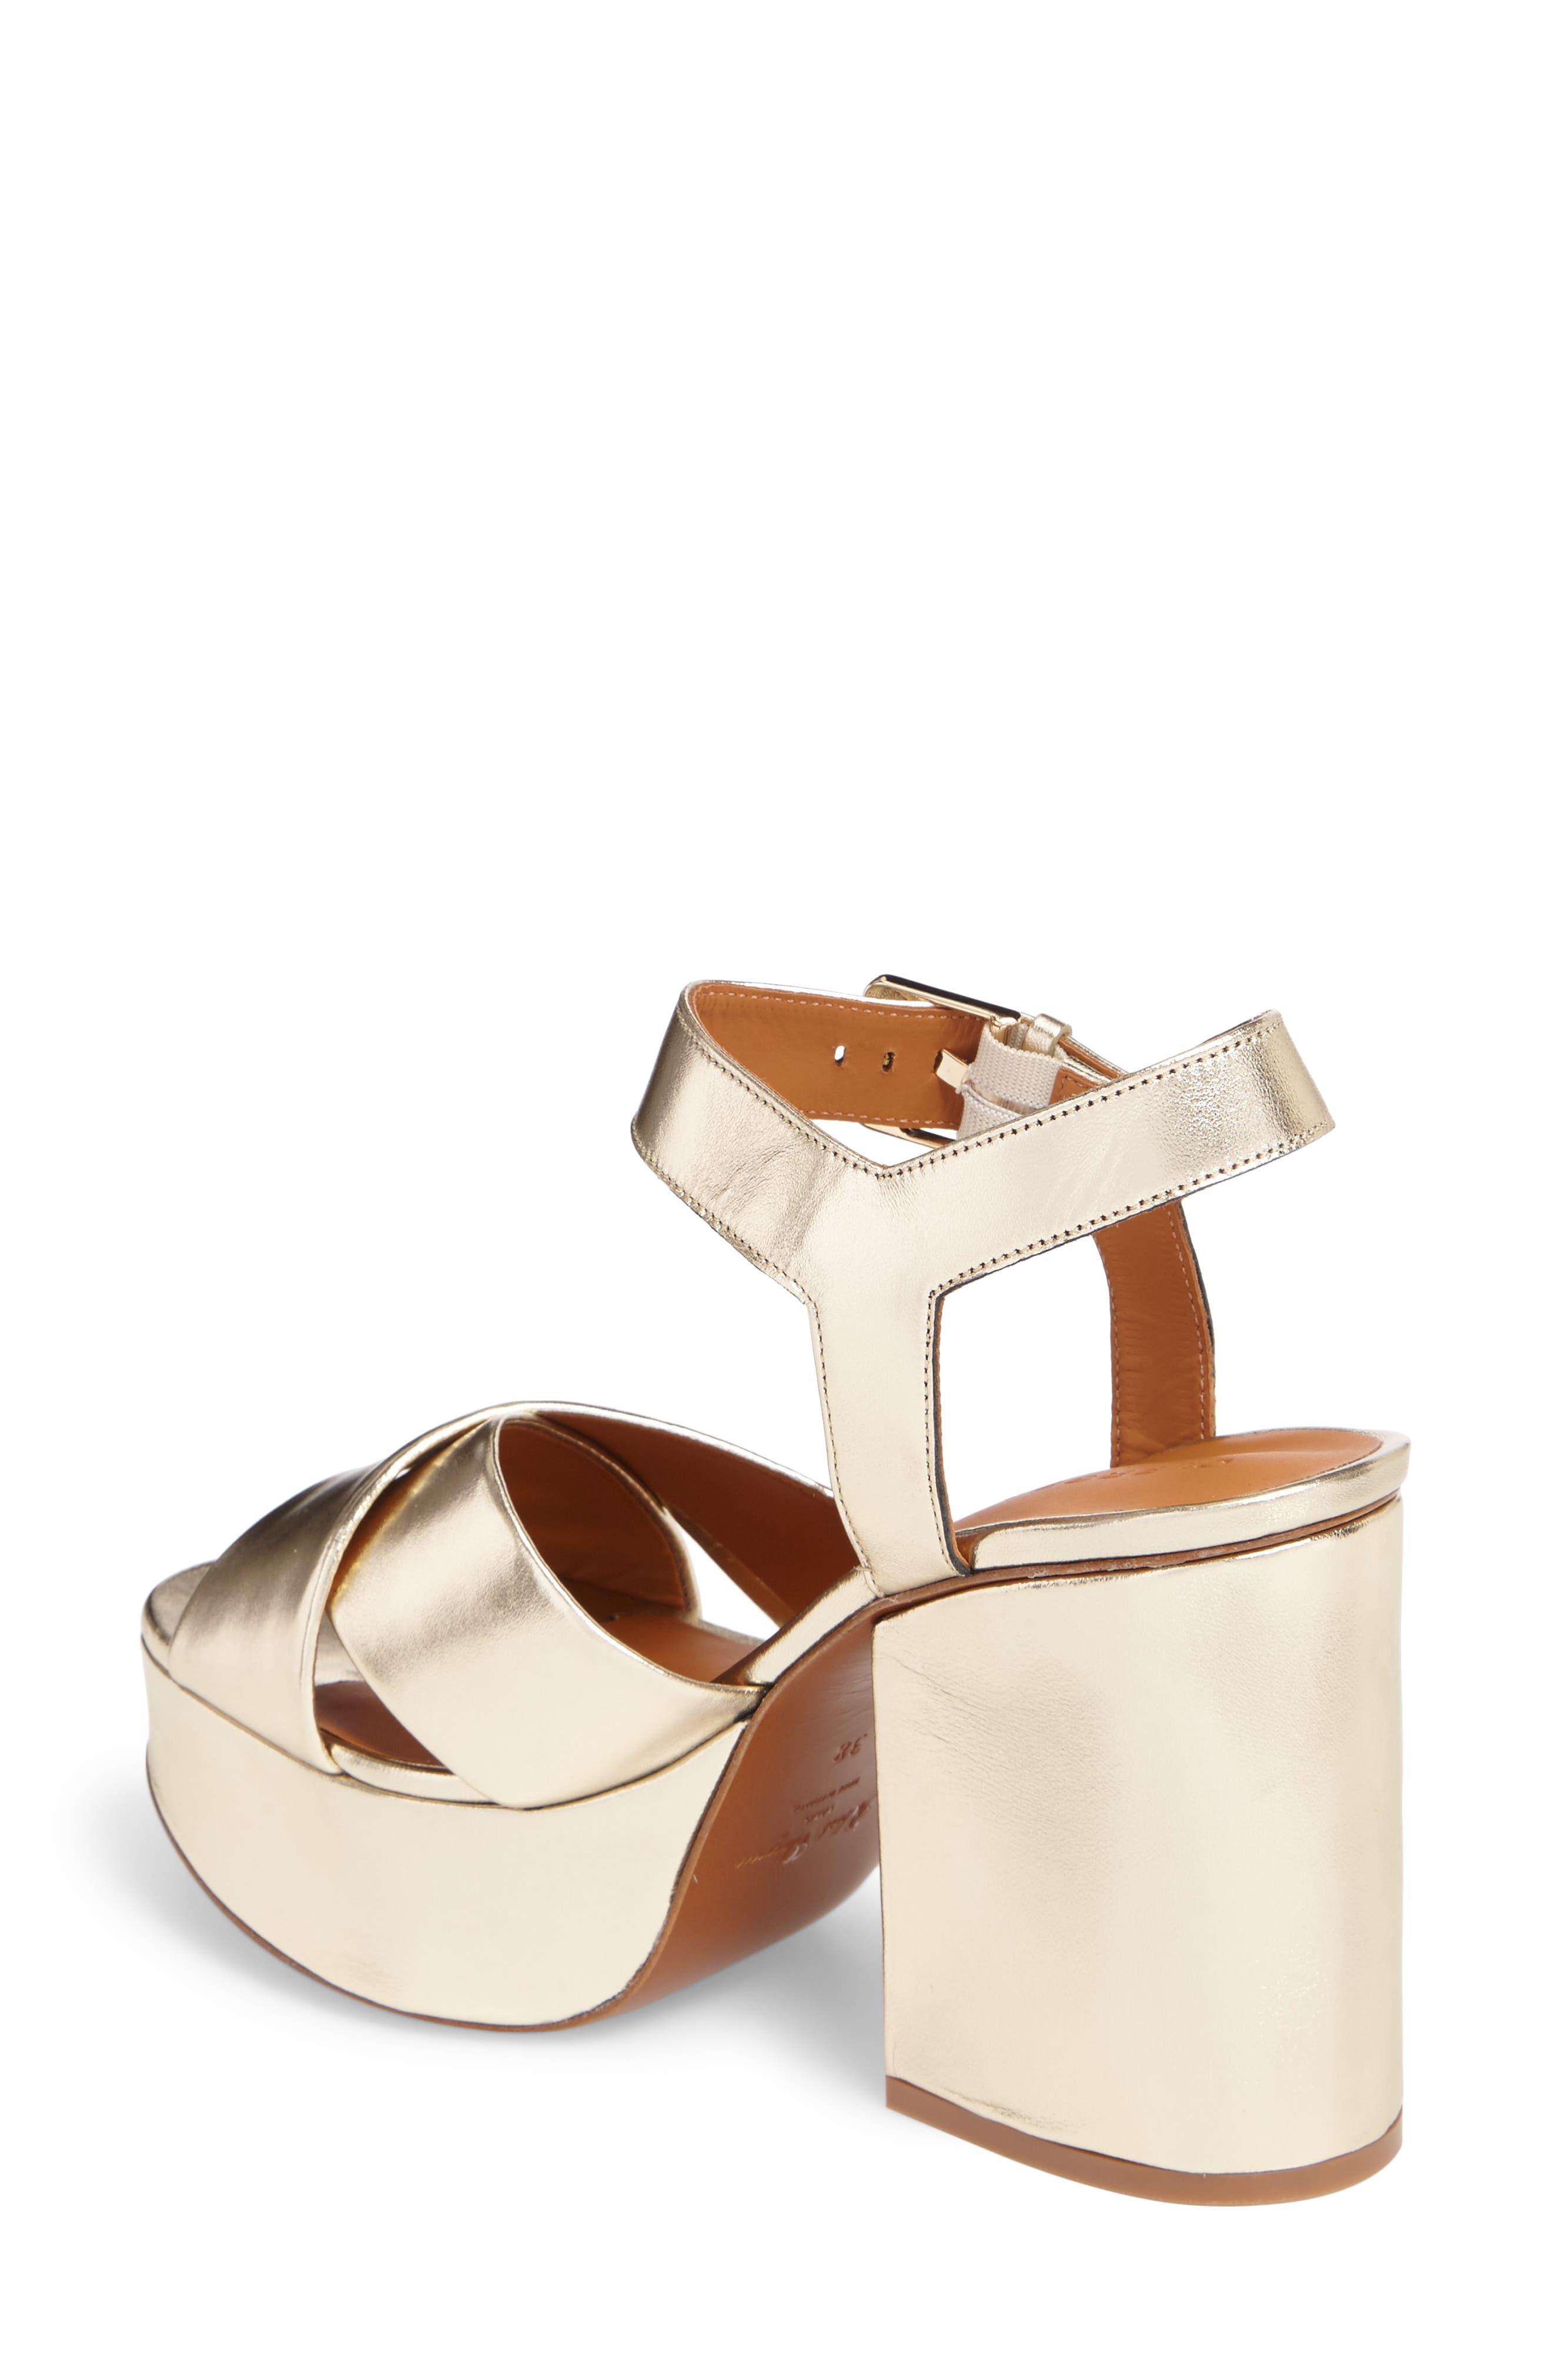 Vianne Ankle Strap Platform Sandal,                             Alternate thumbnail 2, color,                             712